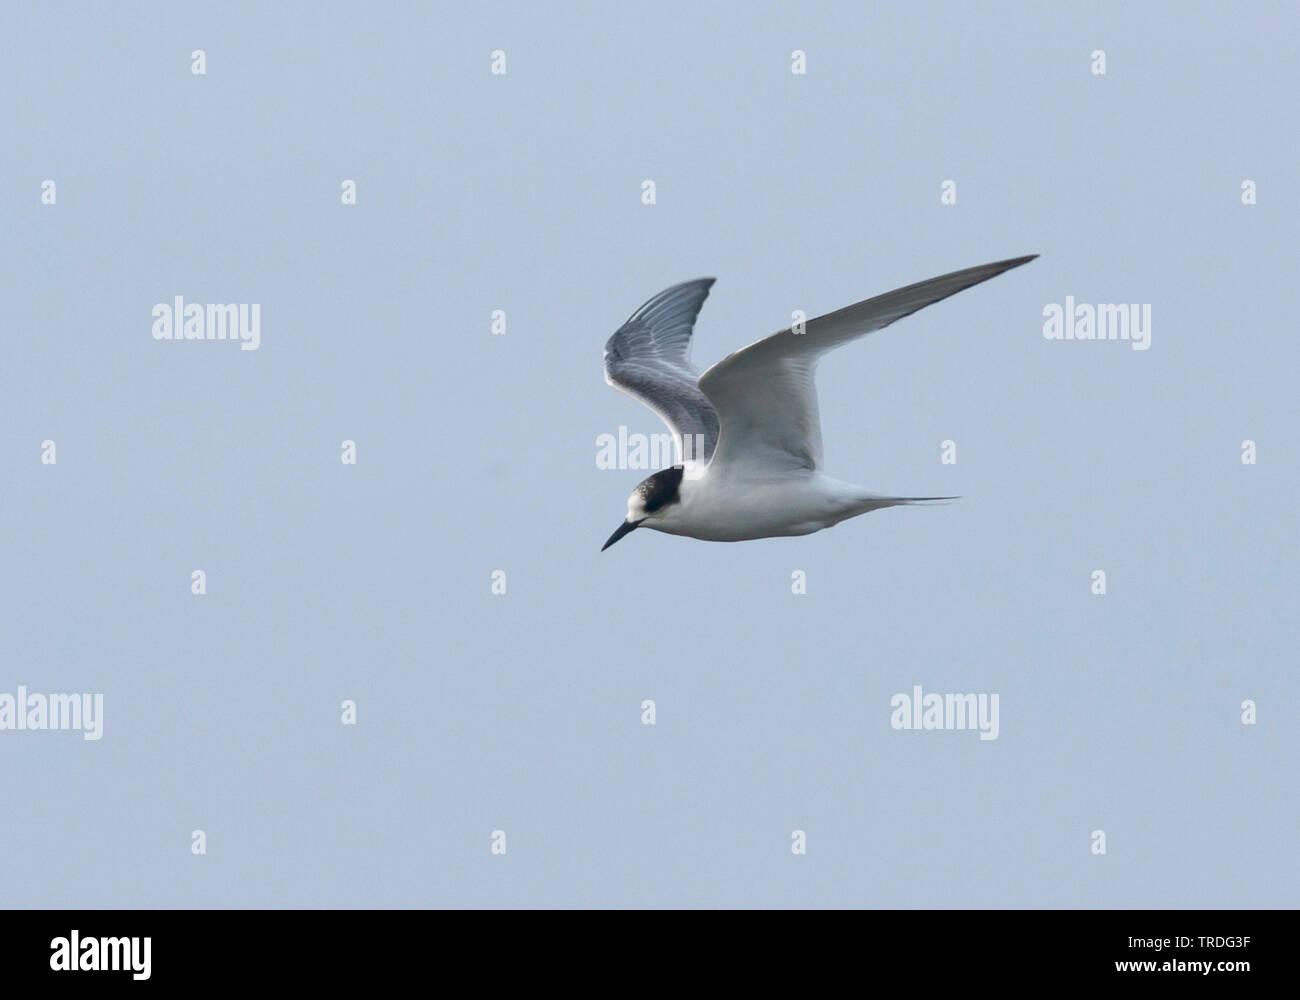 Kuestenseeschwalbe, Kuesten-Seeschwalbe (Sterna paradisaea), fliegen, Deutschland | arctic tern (Sterna paradisaea), flying, Germany | BLWS503030.jpg - Stock Image